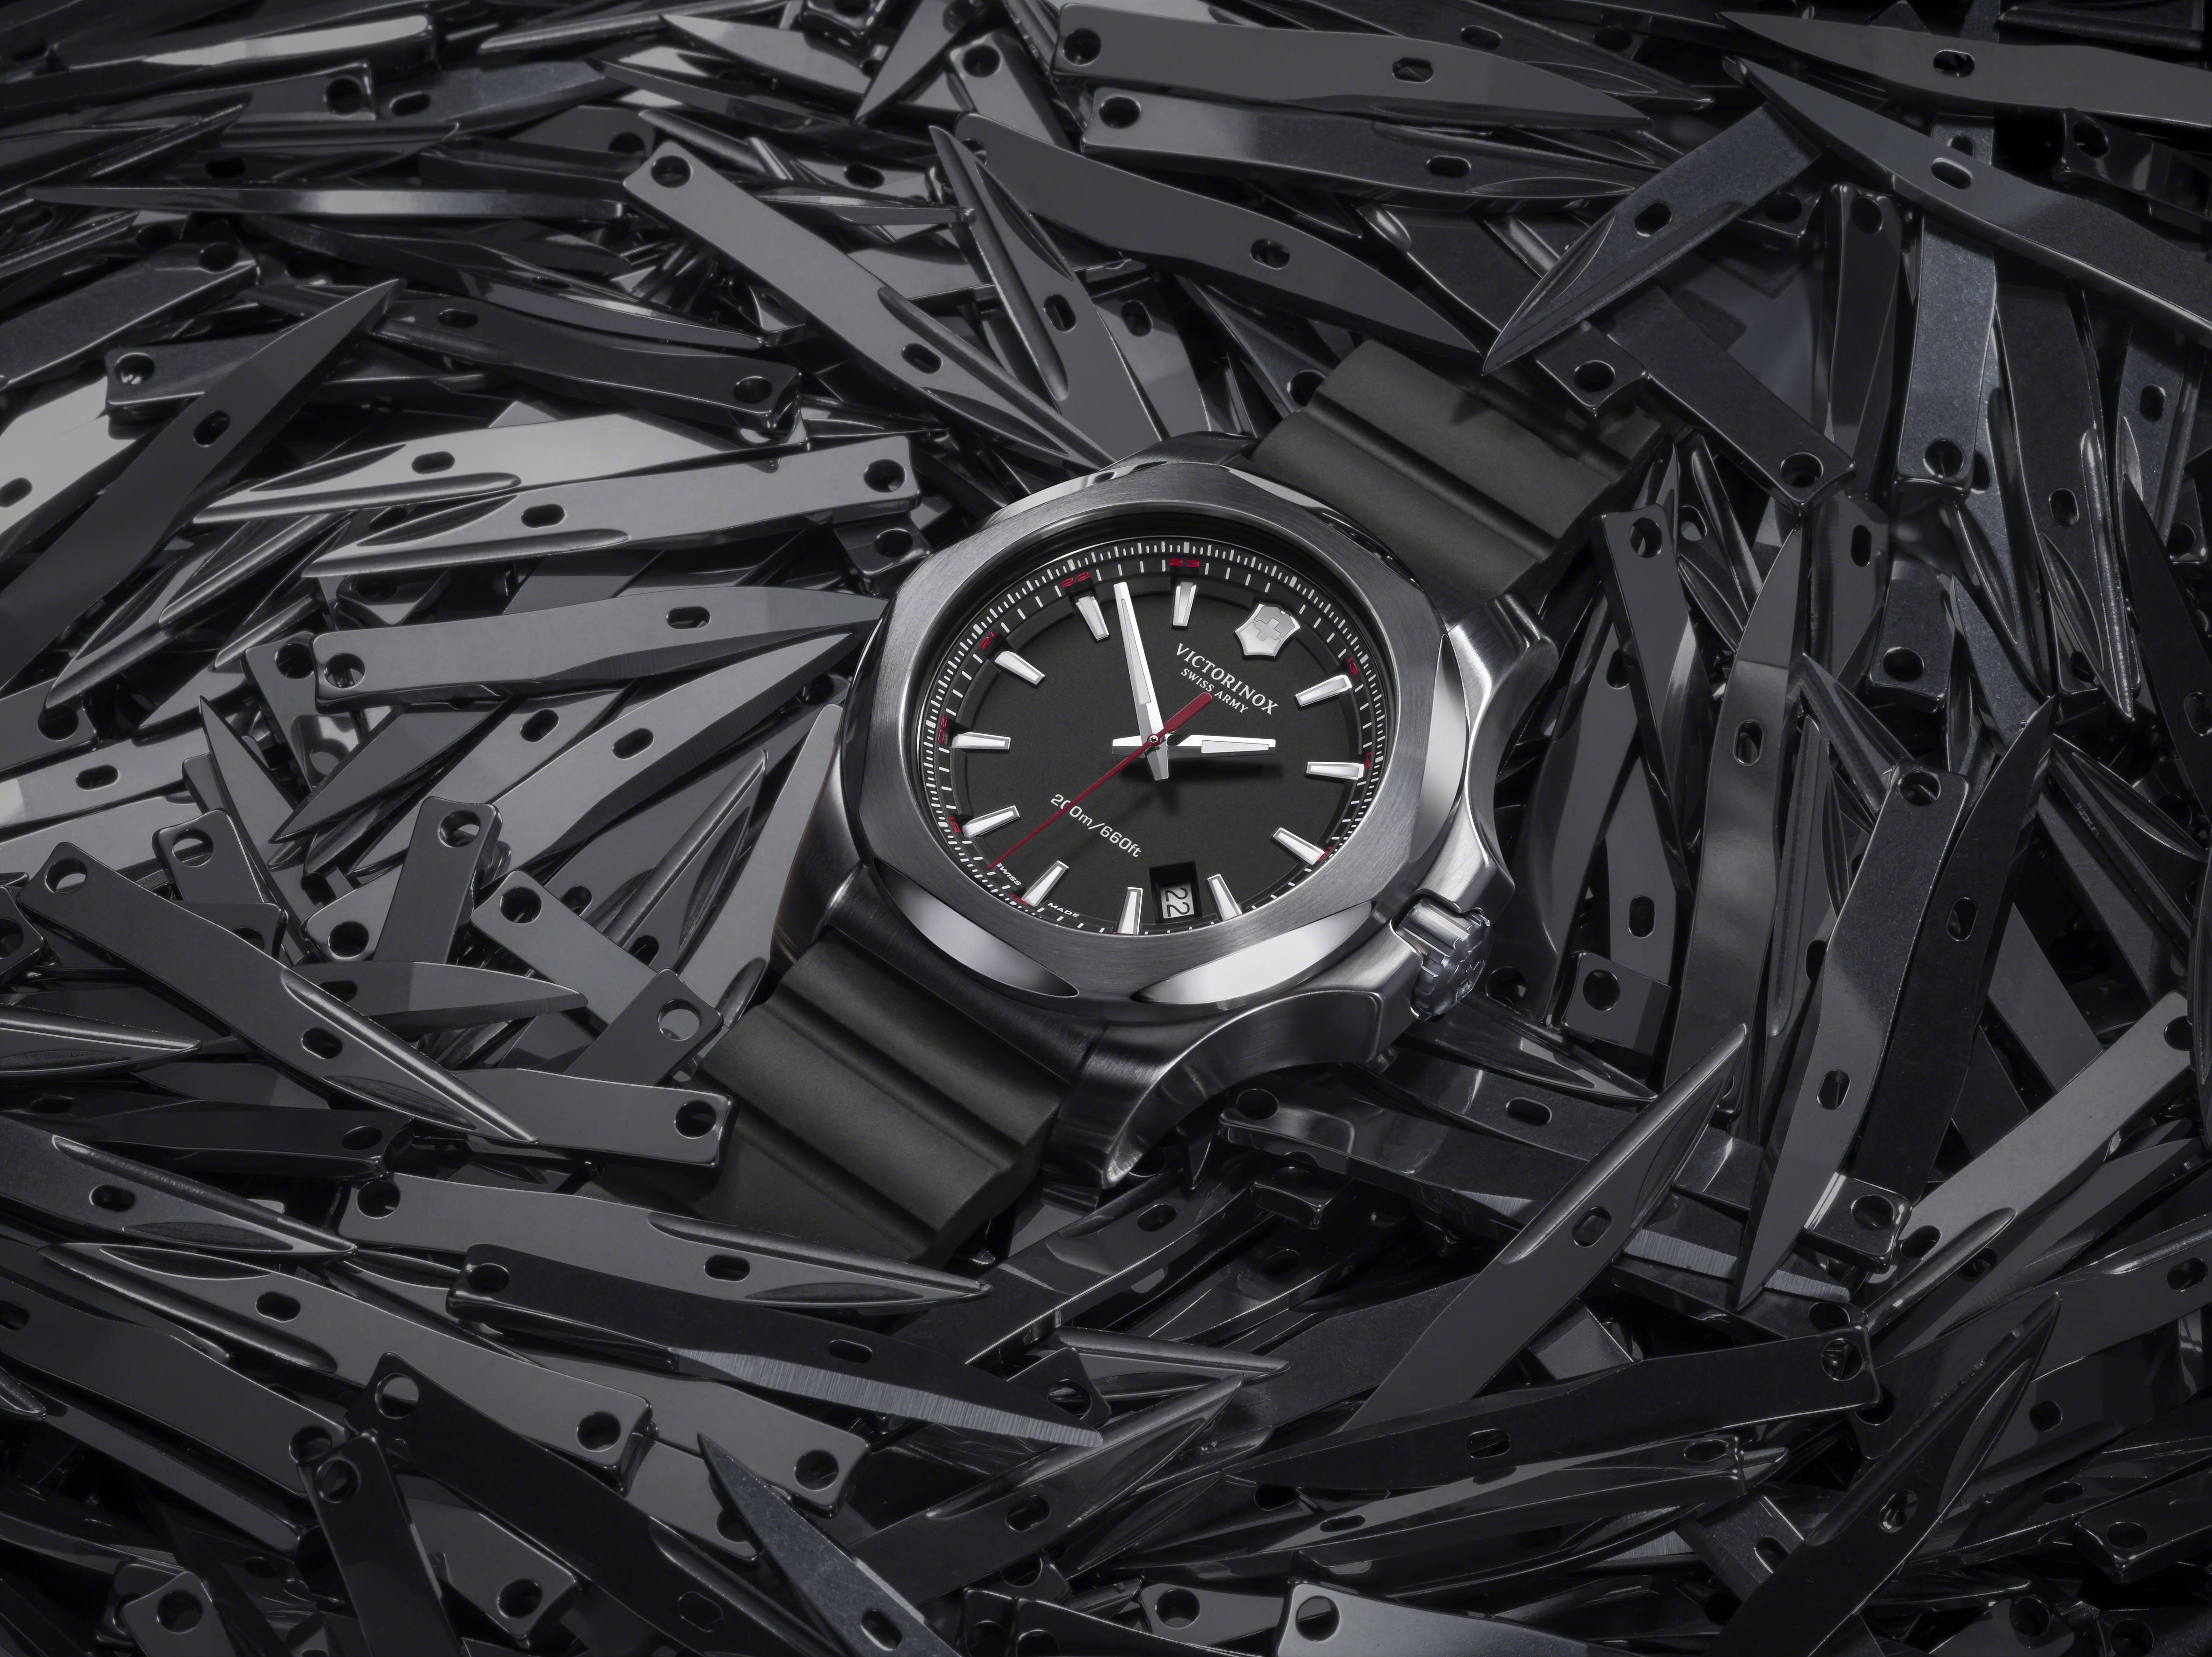 I.N.O.X: The new Victorinox watch